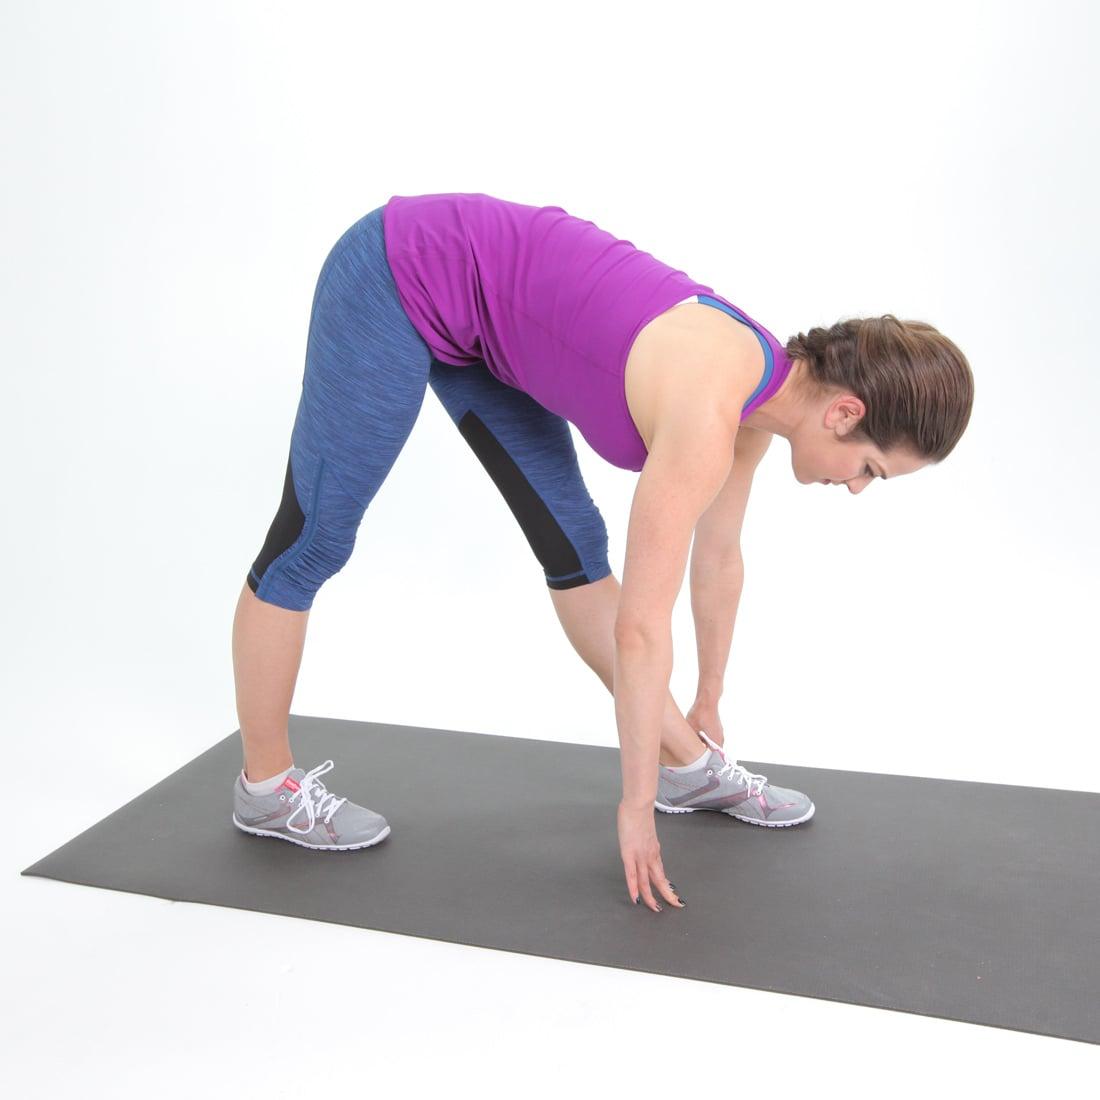 Tight Hamstring: Scissor Hamstring Stretch